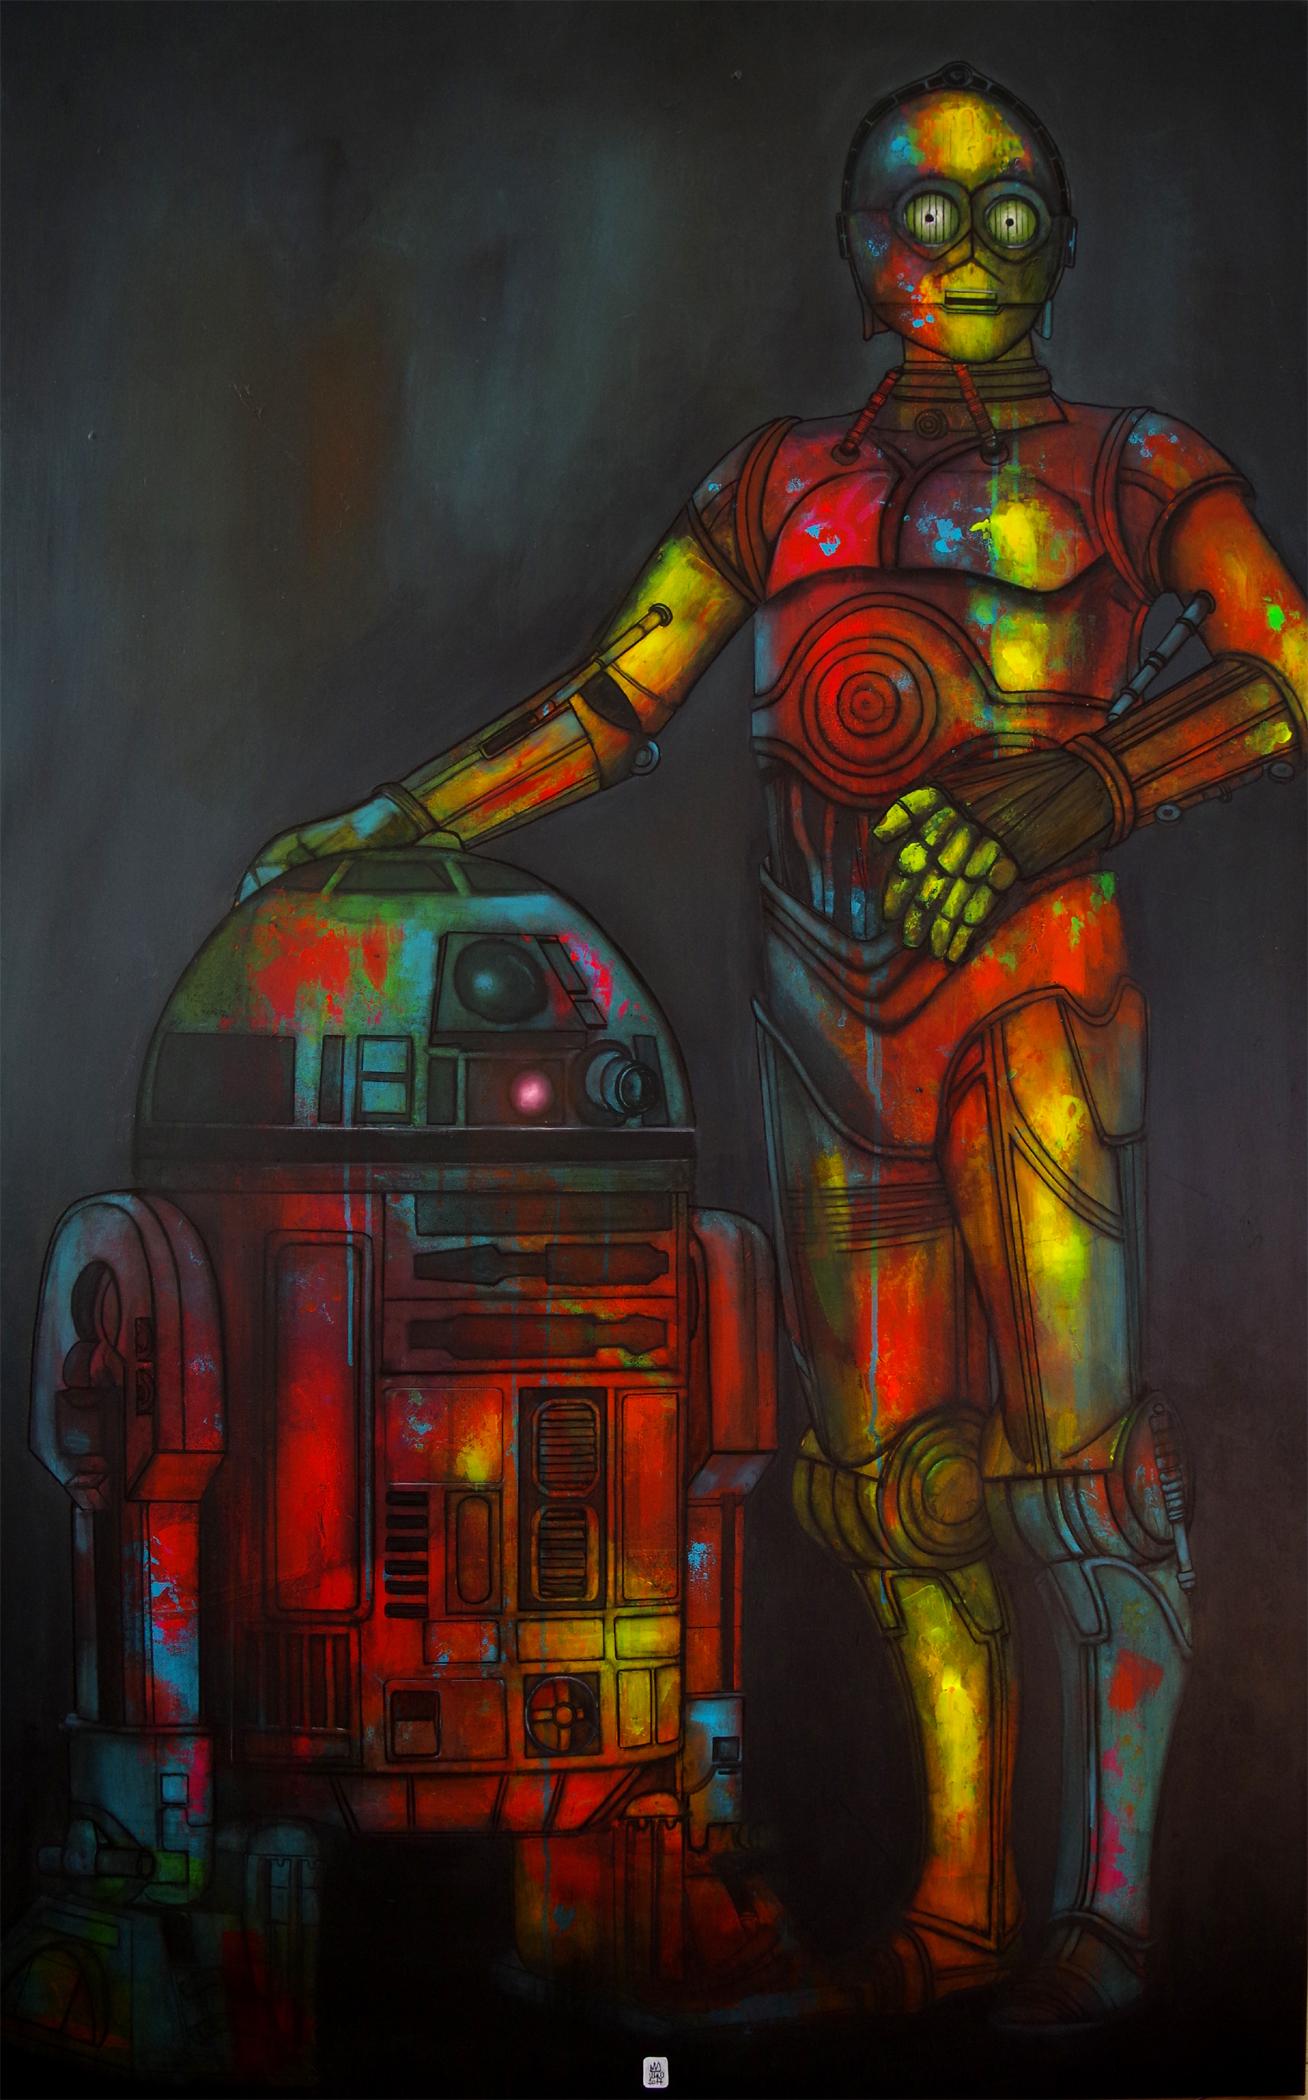 R2D2 & C3PO